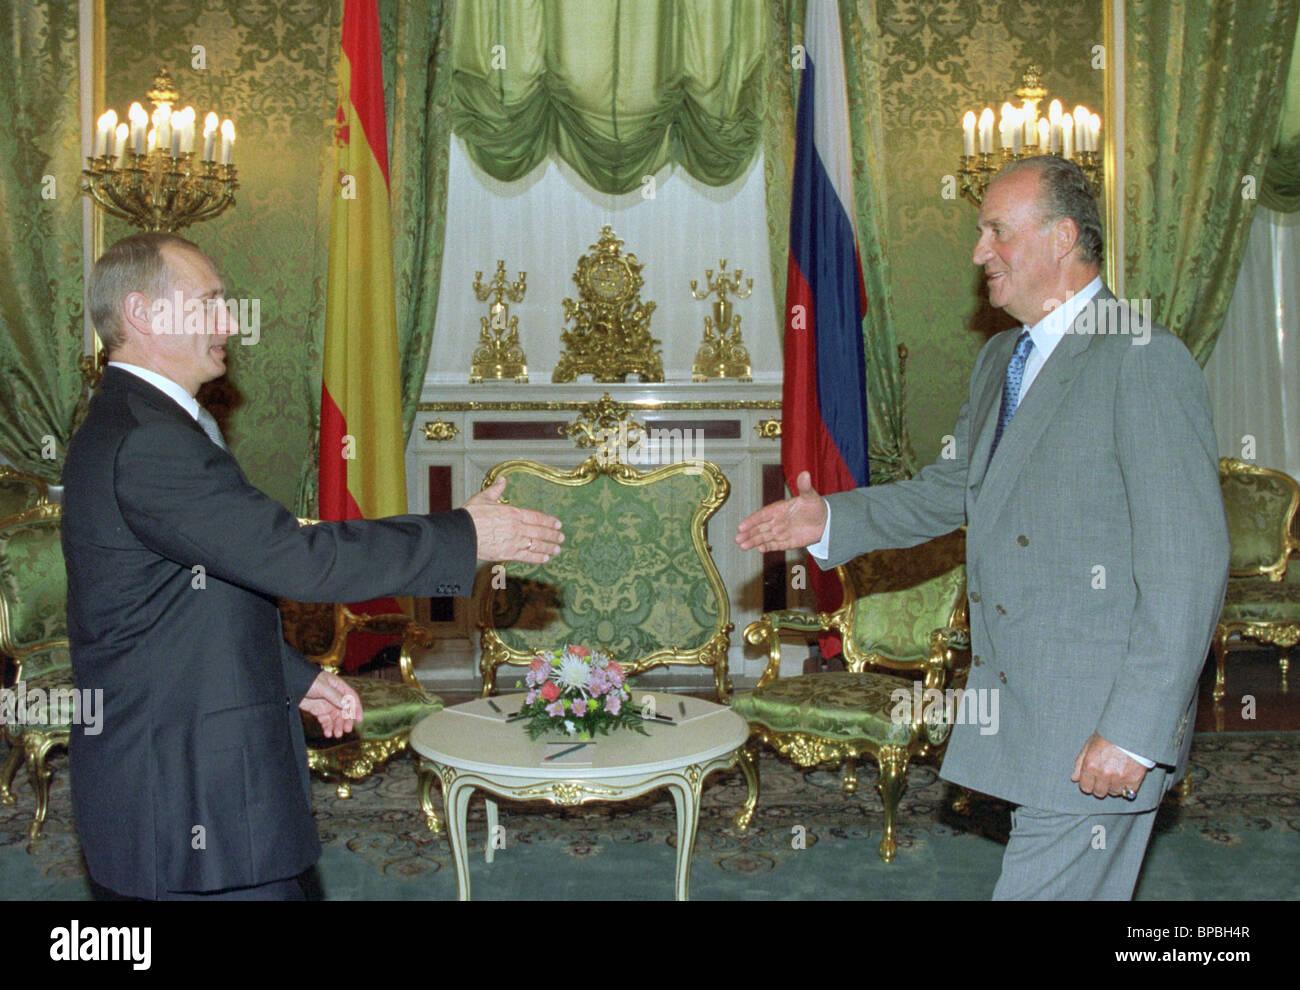 President Putin meets with King Juan Carlos I of Spain - Stock Image